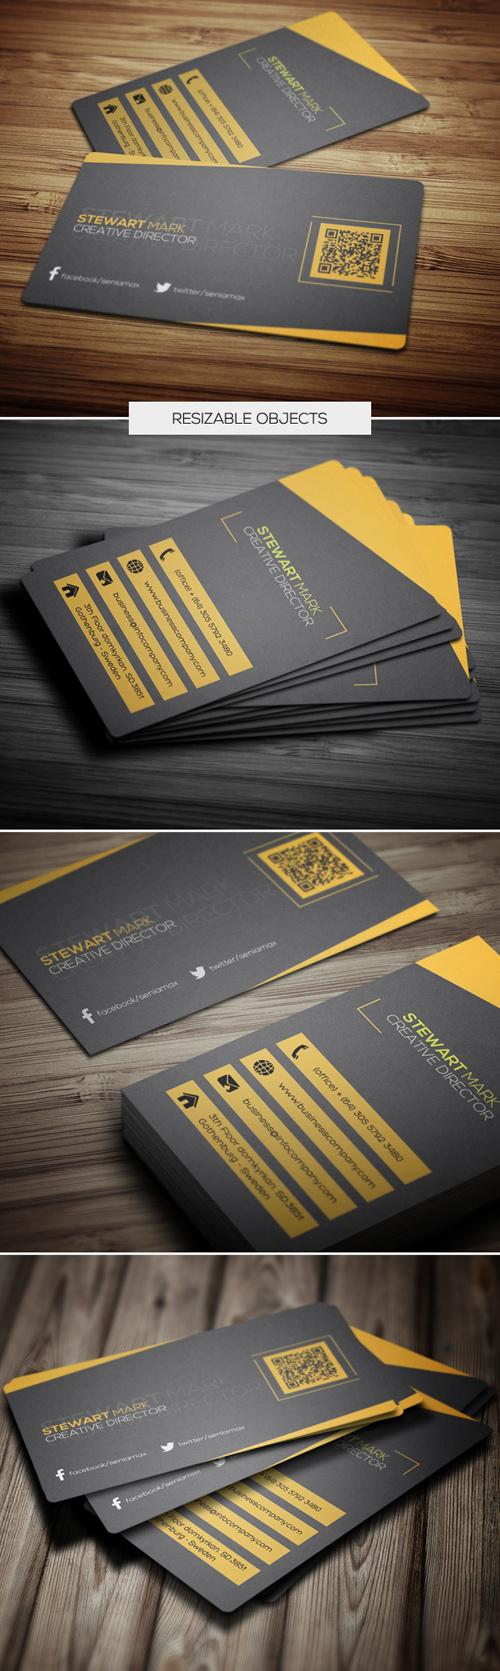 Creative Director Business Cards Design-5